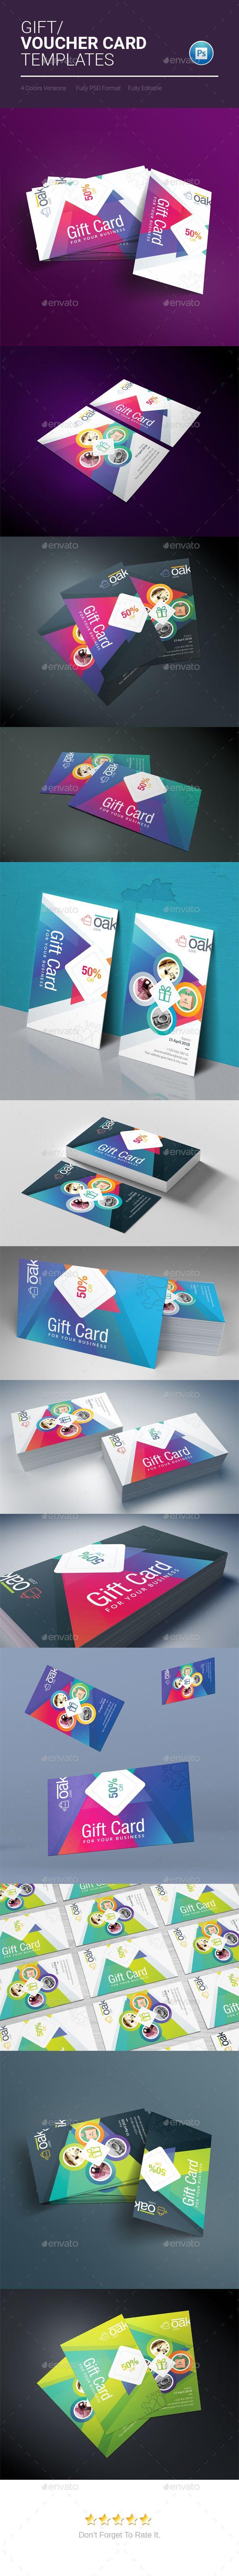 33 best gift voucher templates images on pinterest font logo